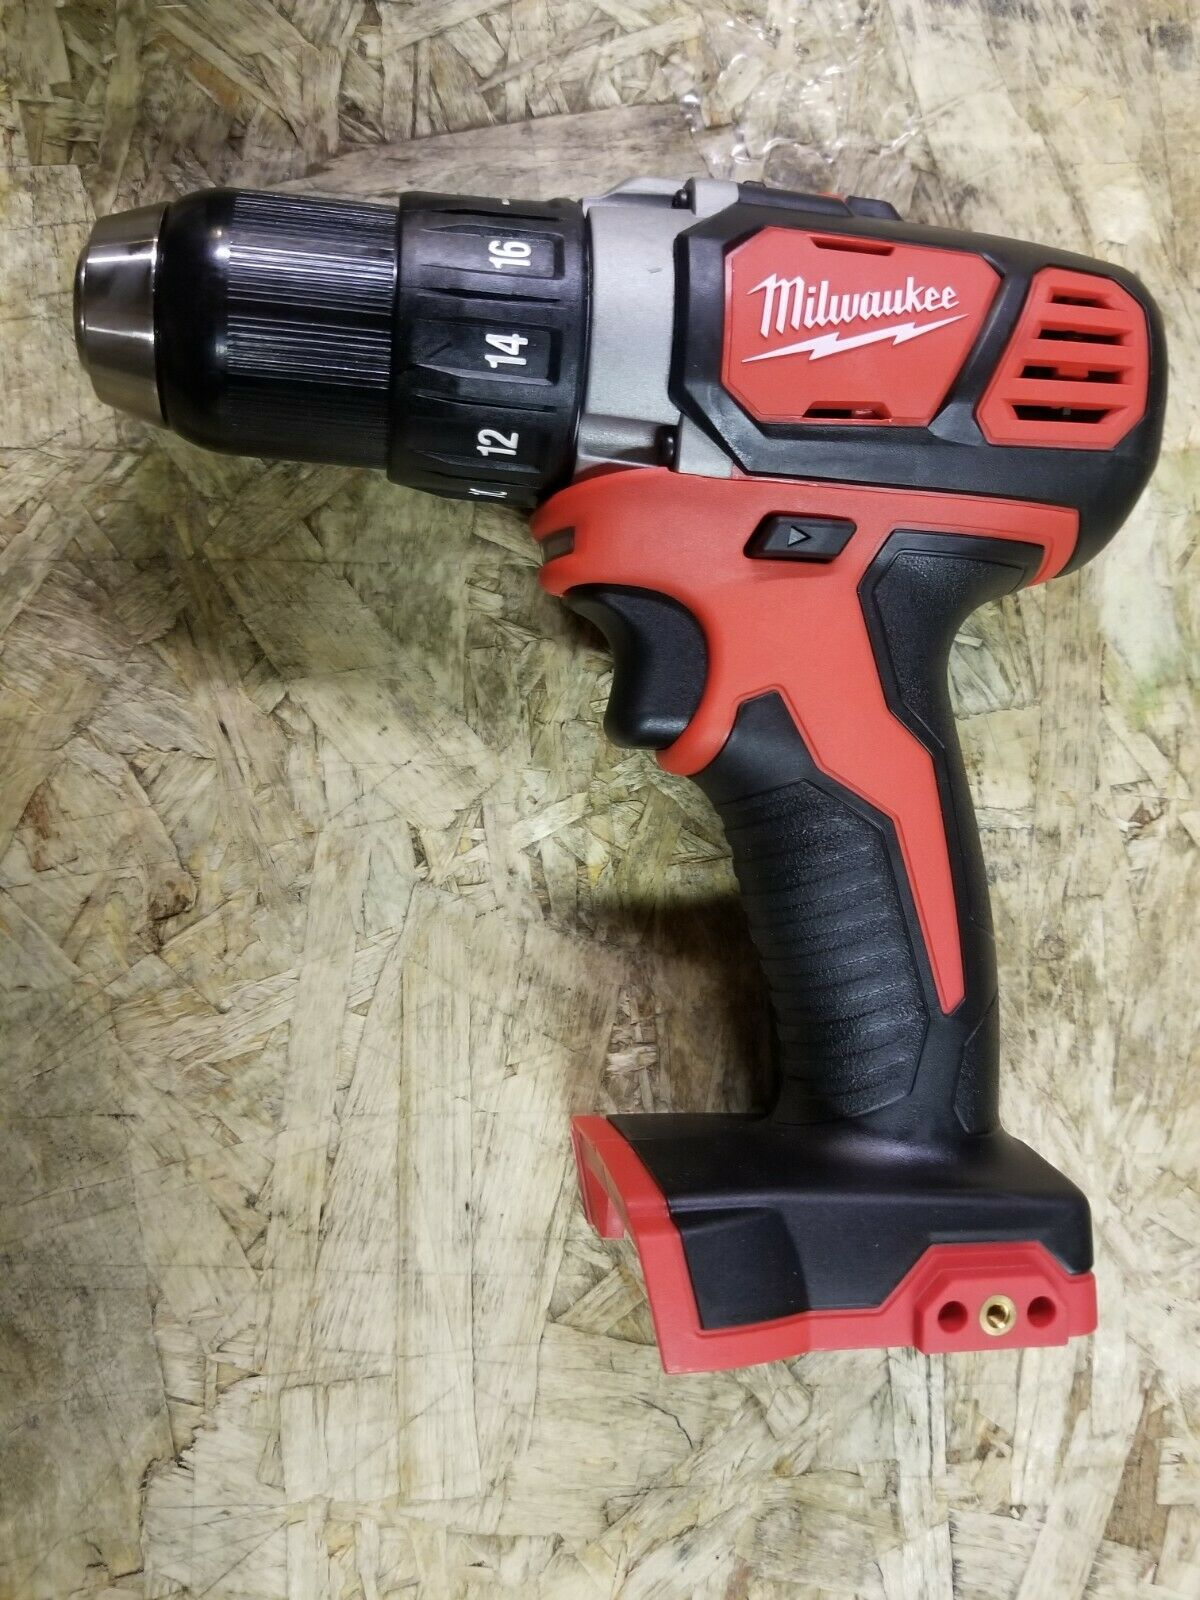 2606-20 brokeredgar760 Milwaukee 2606-20 M18 18V Compact 1/2 Drill Driver DATED 2021